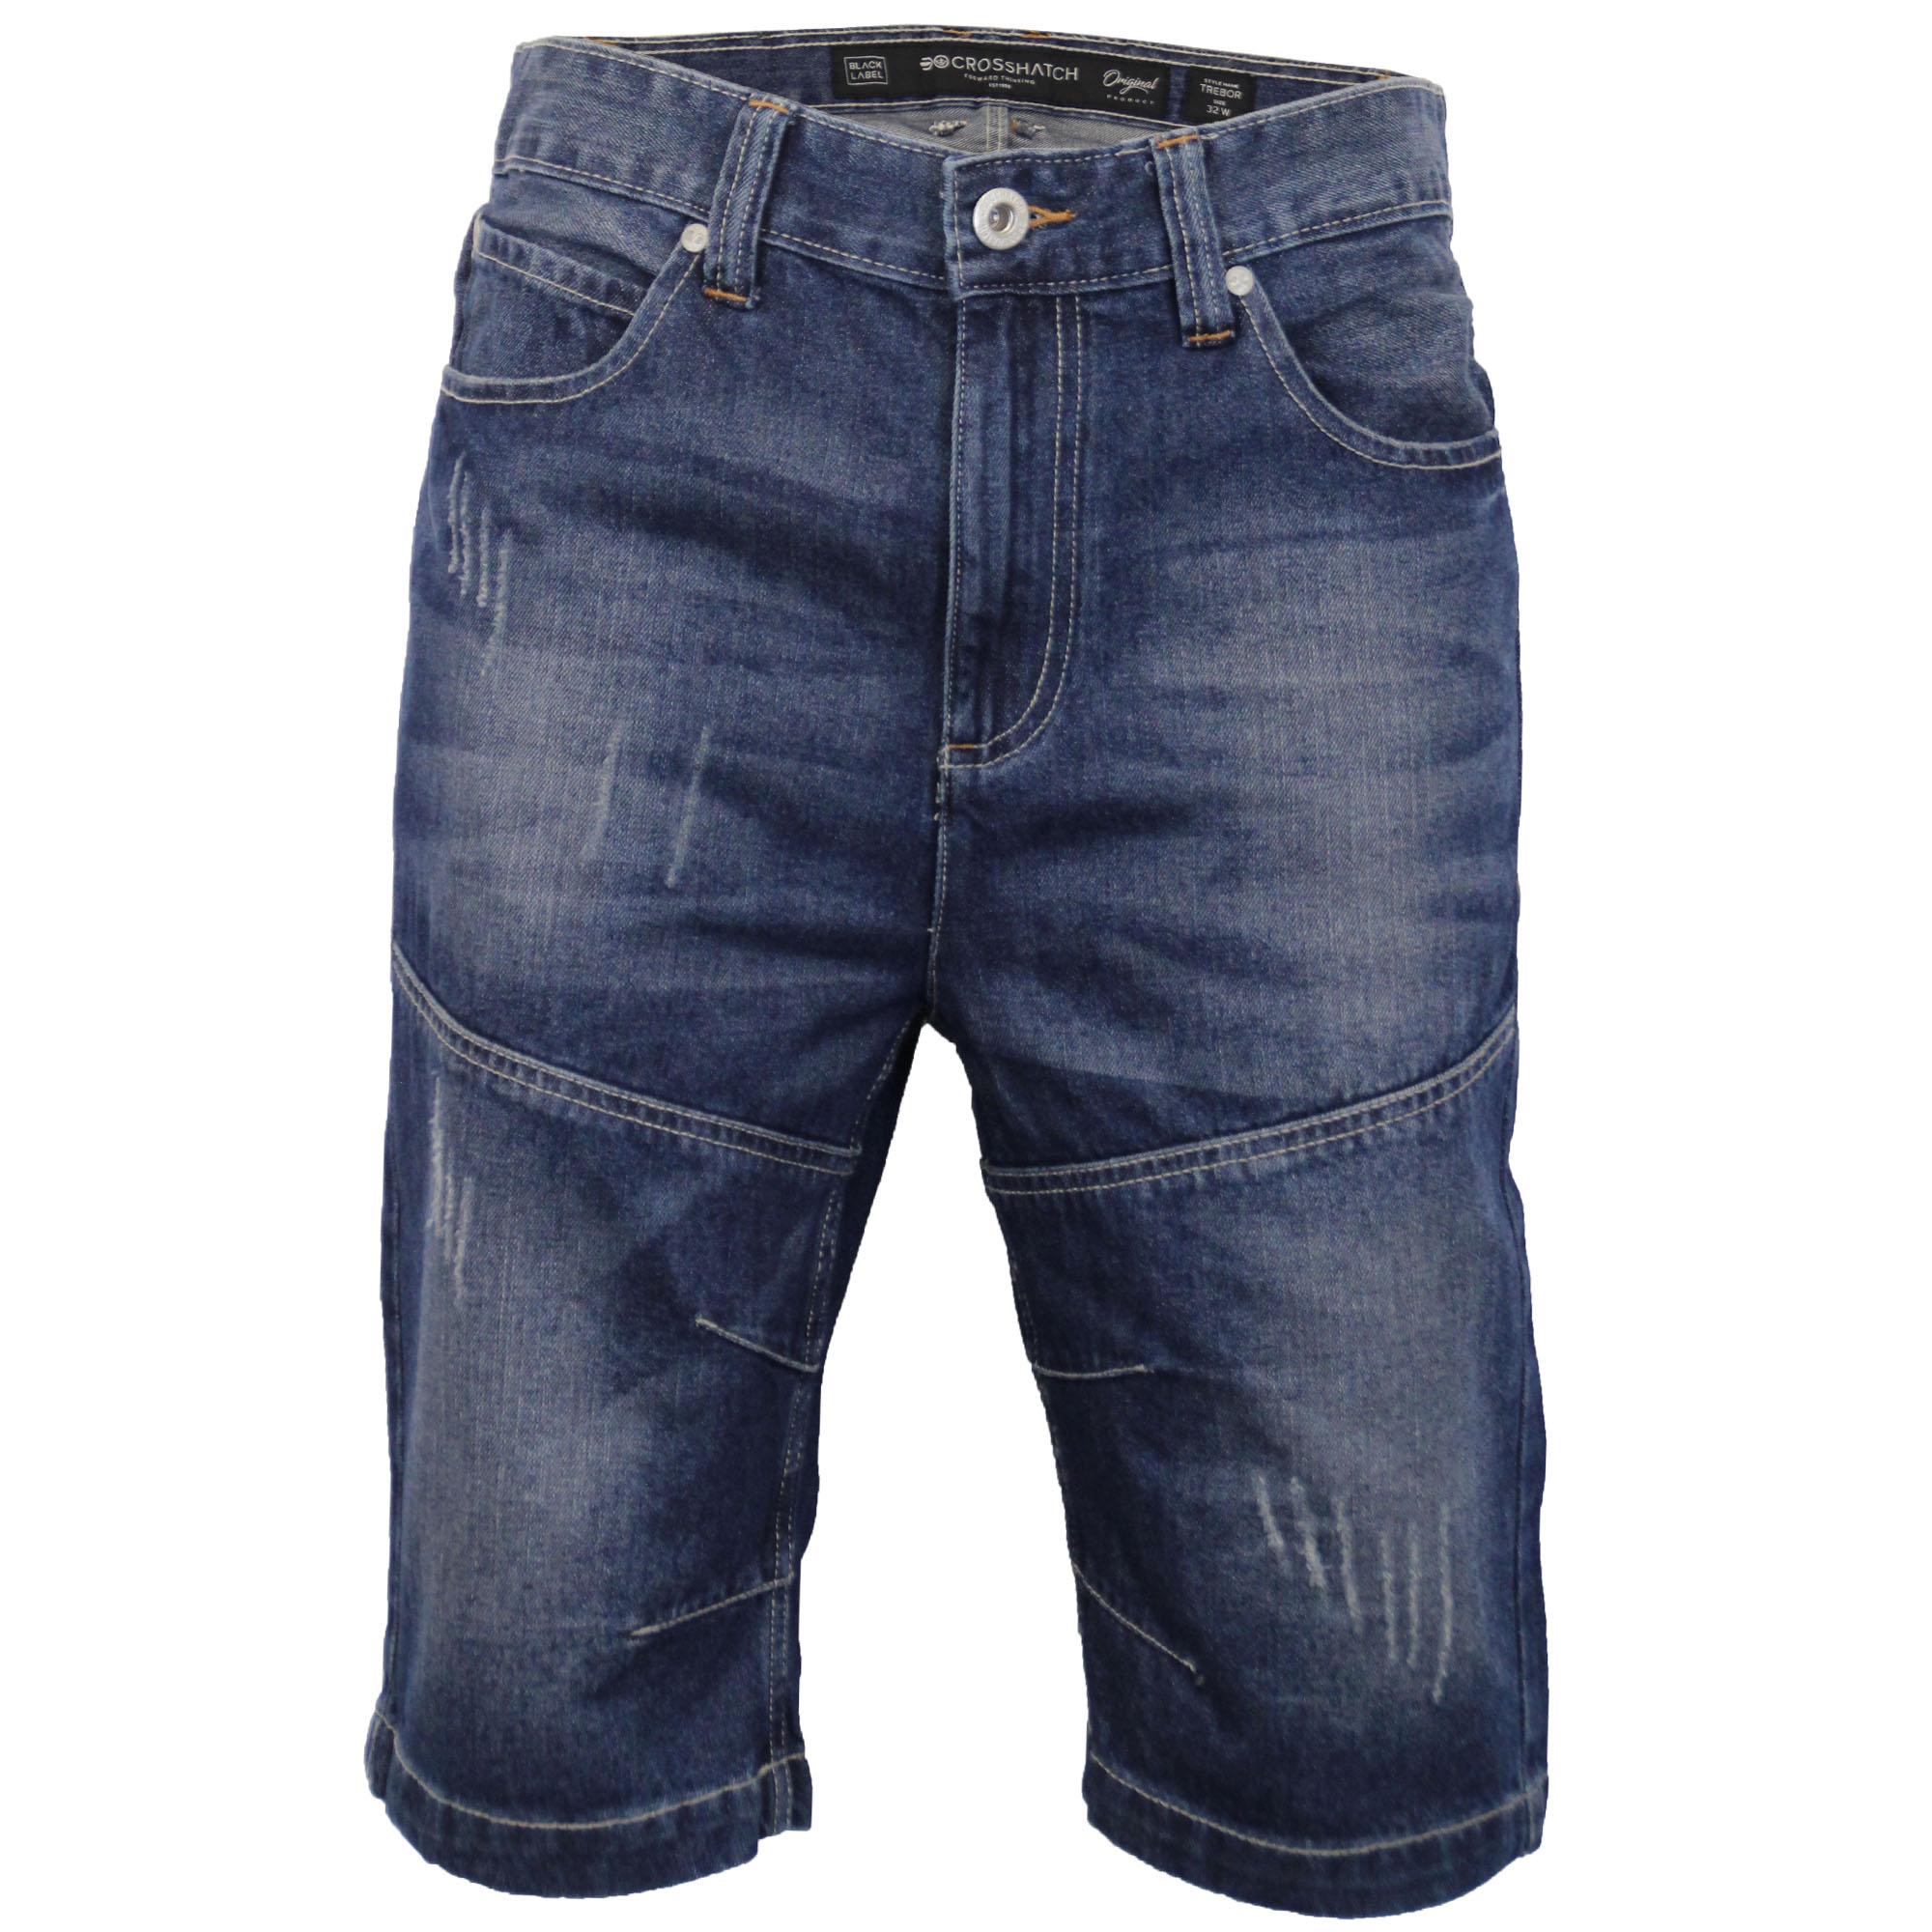 Mens-Crosshatch-Denim-Knee-Length-Combat-Shorts-Cargo-Casual-Fashion-Summer-New 縮圖 17